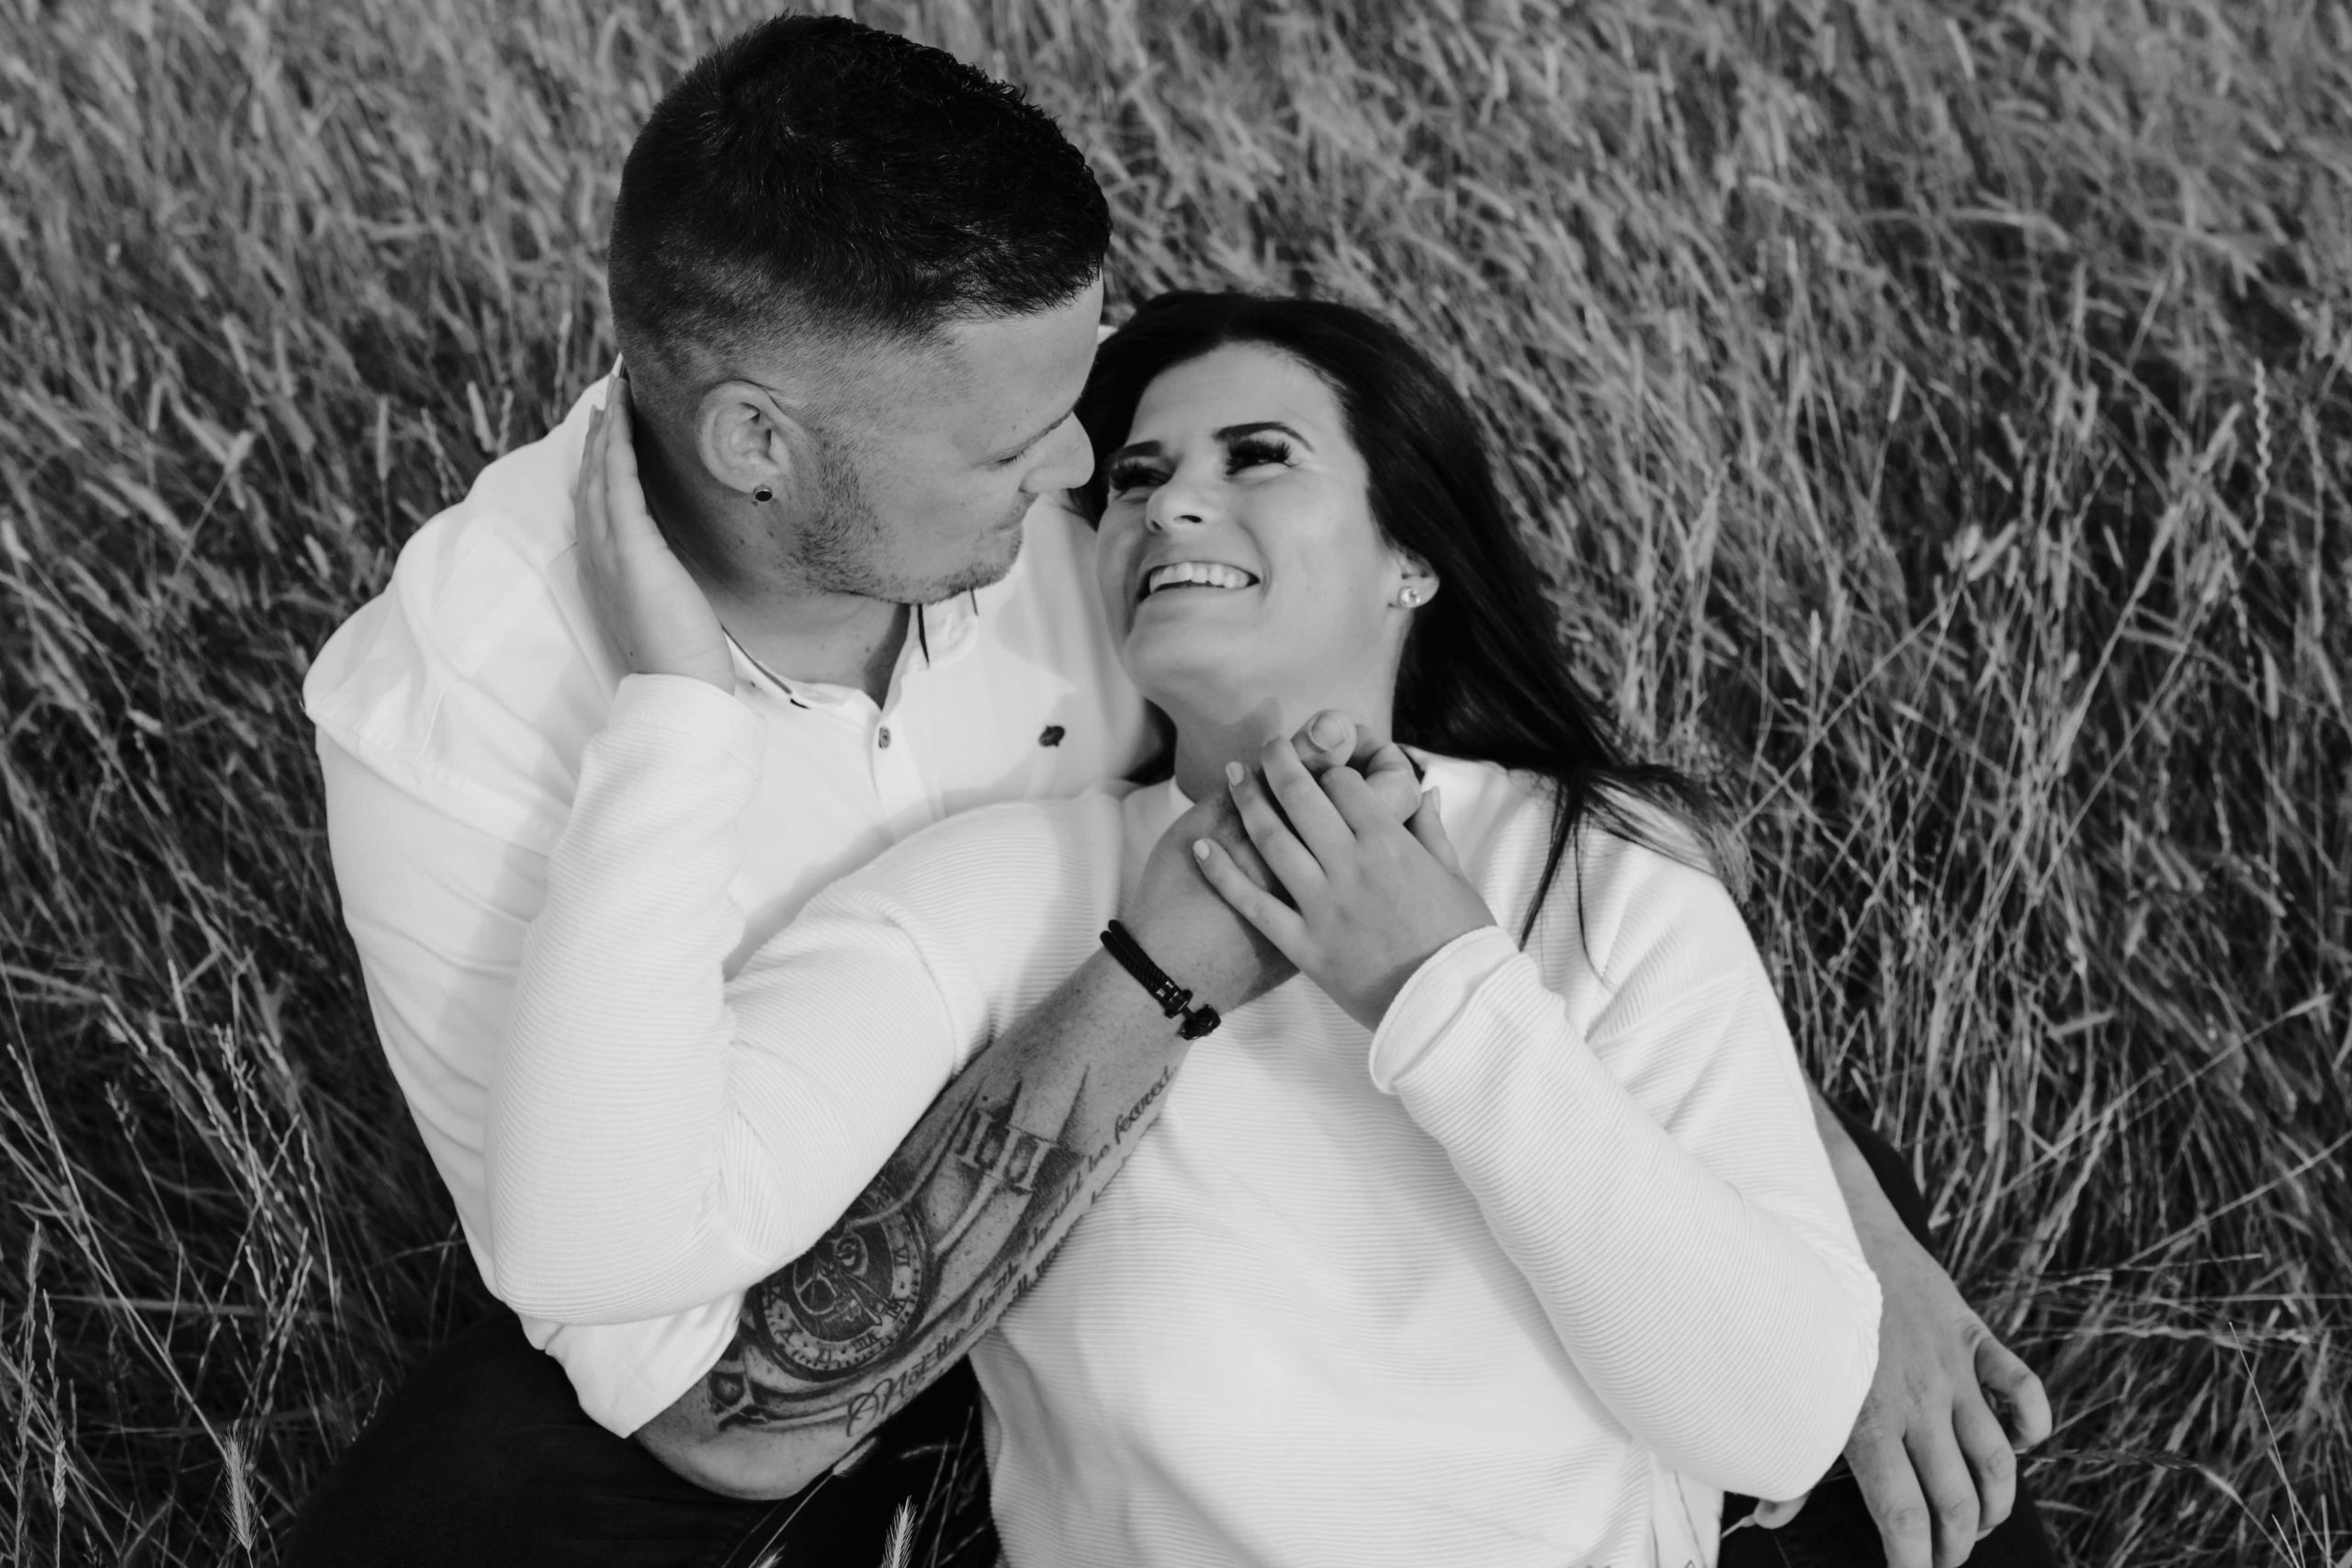 Paarshooting, Paarfotografie, Outdoorshooting, Verlobung, Liebe, Verlobt, Fotografin, Pilsum Leuchtturm